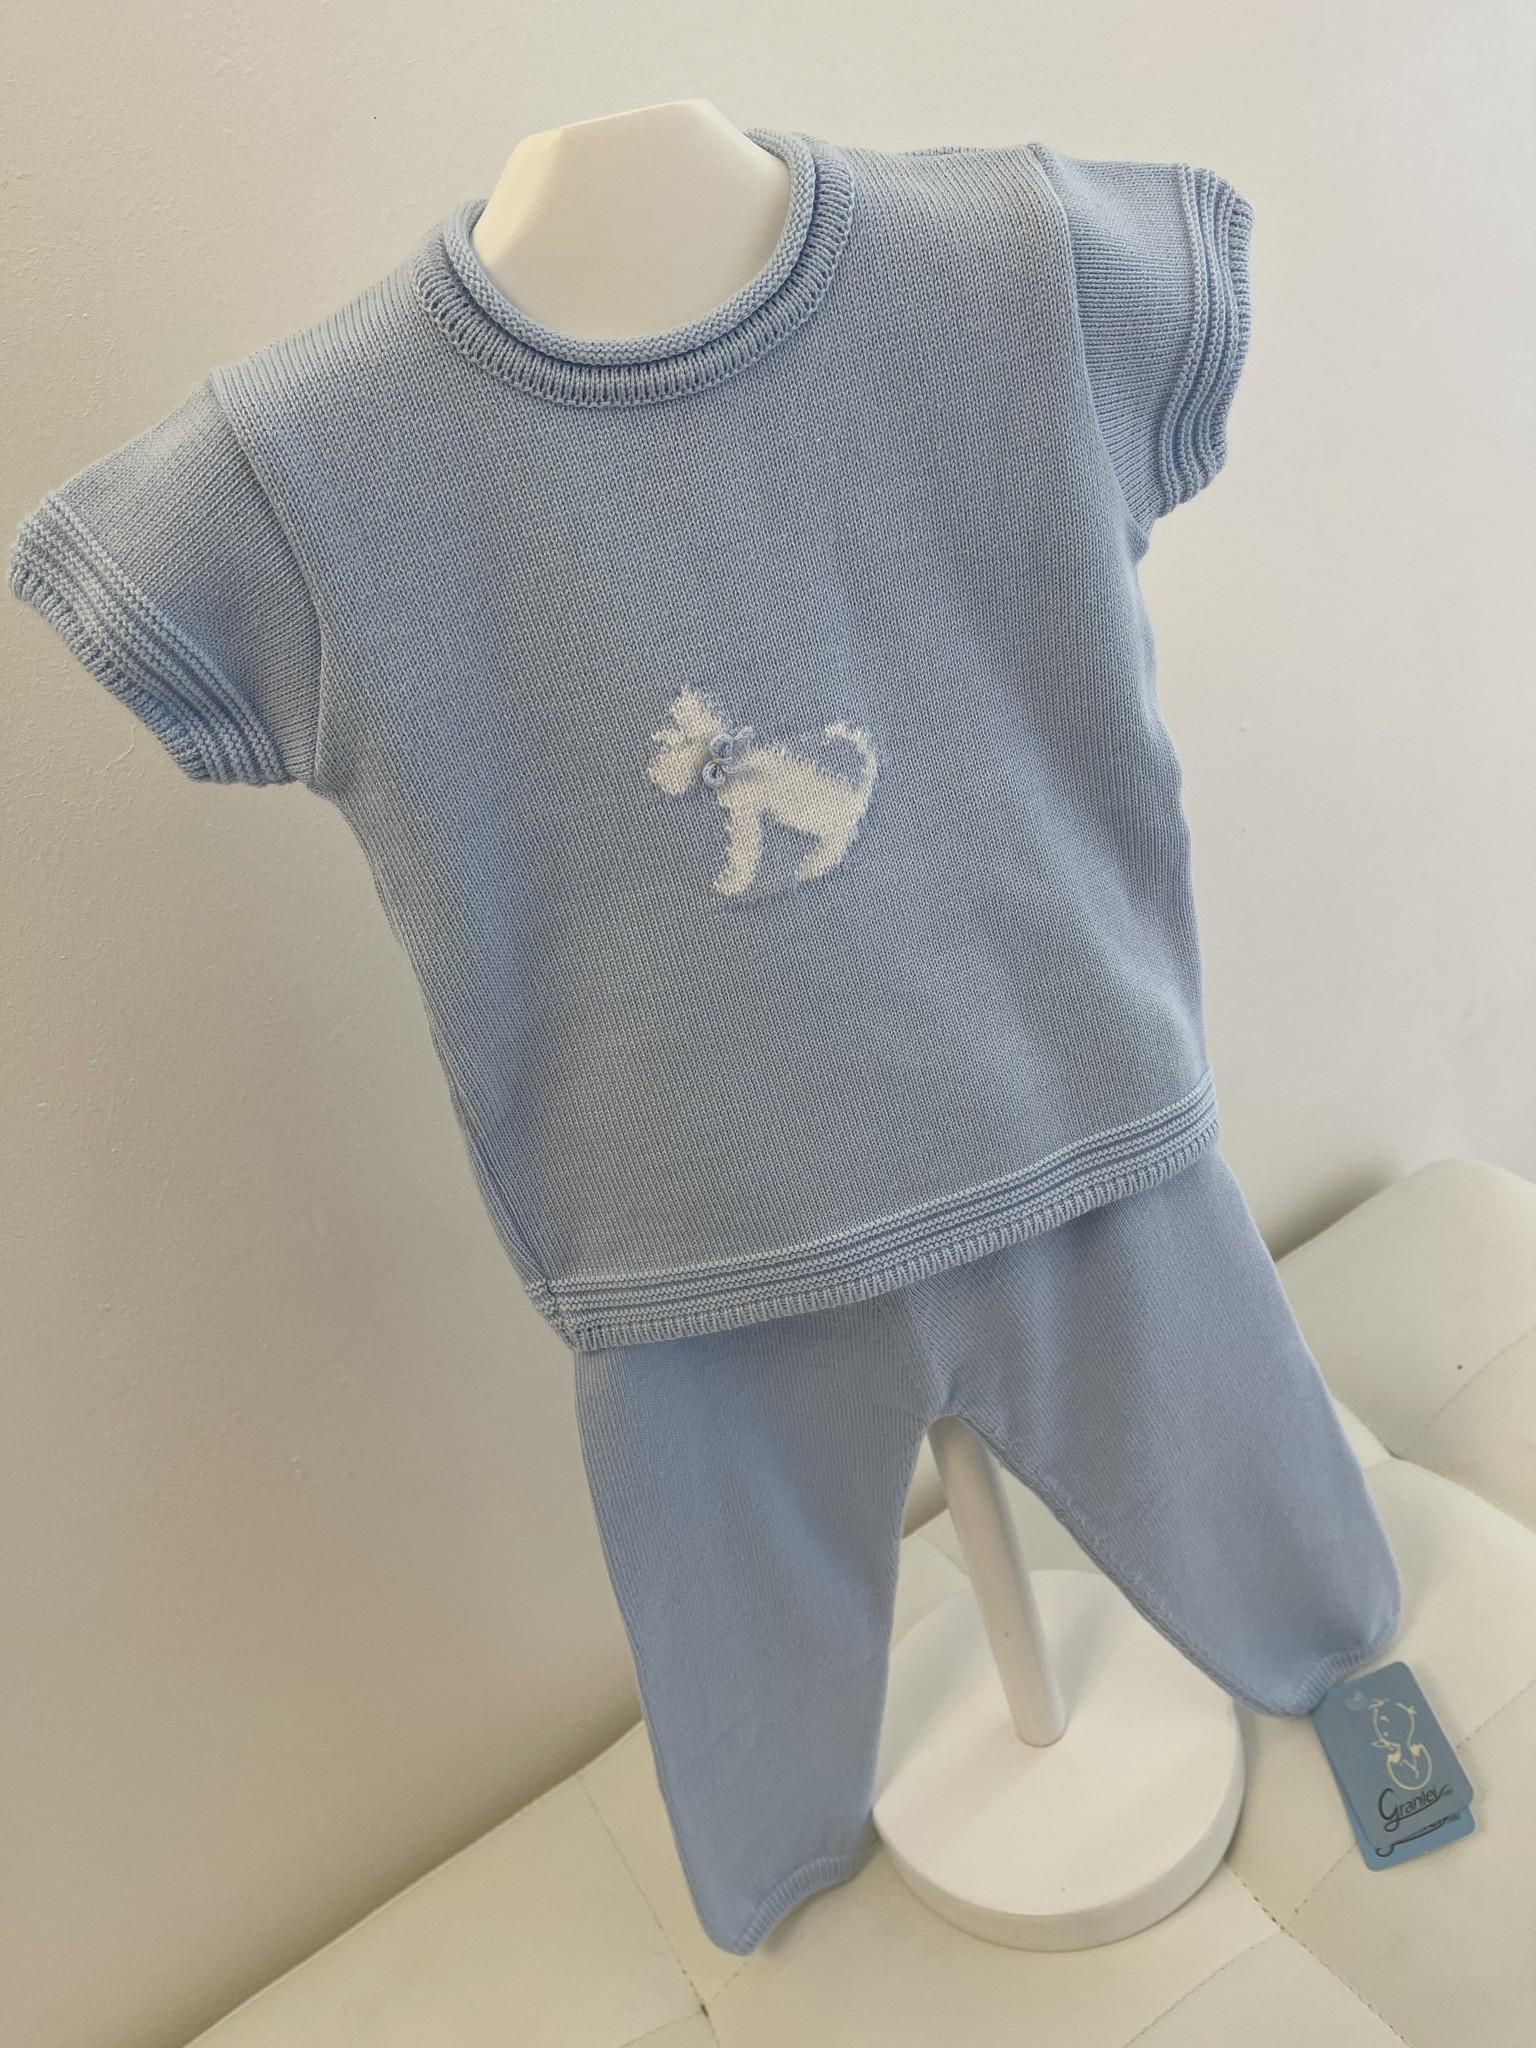 Artesania Granlei Artesania Granlei Blue Dog Knit Set S21